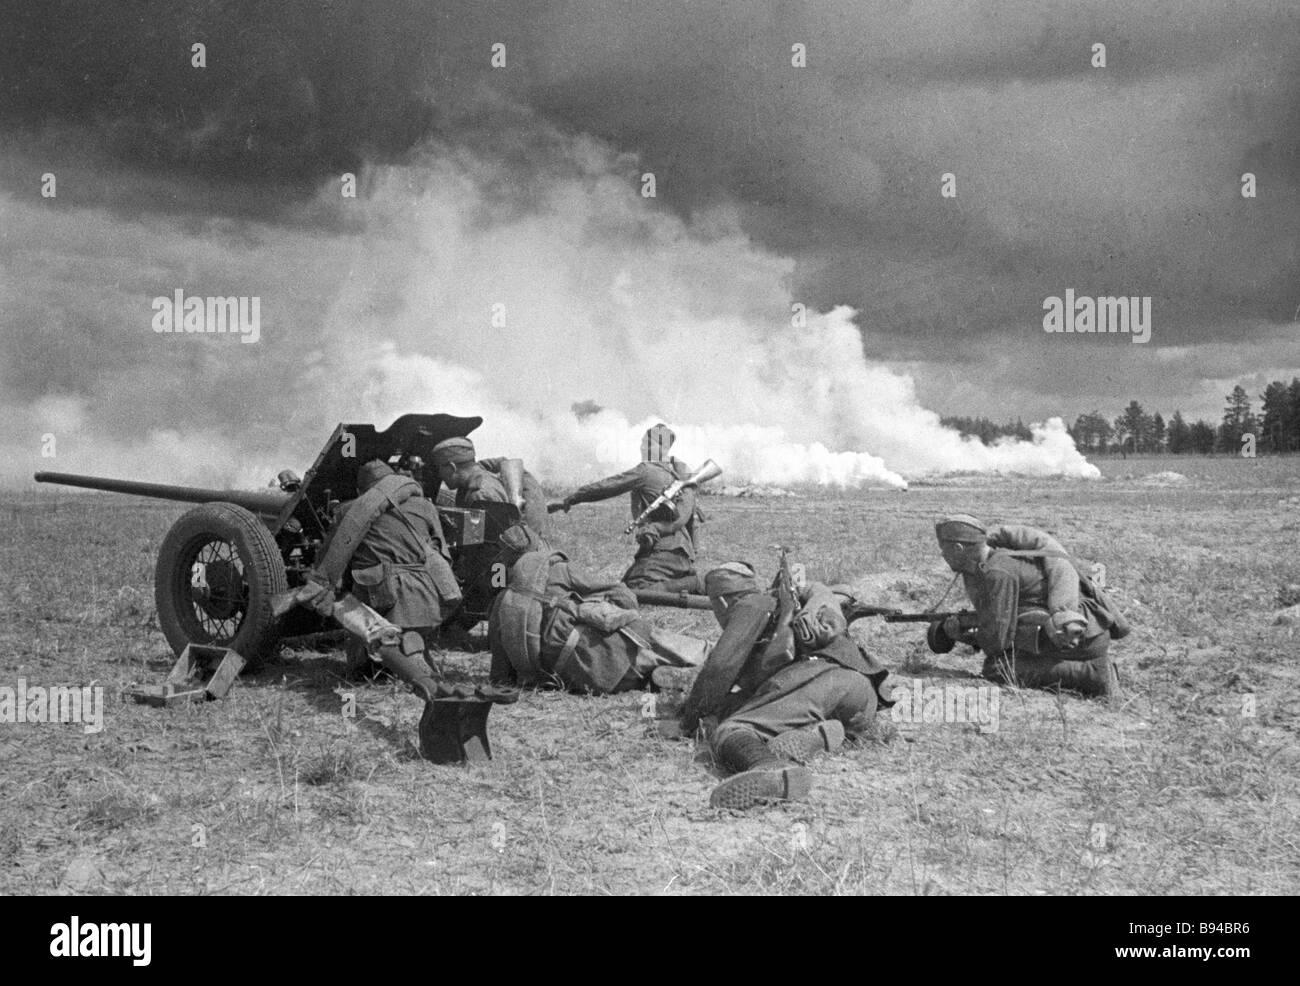 Central front gunners battering Direct fire from sorokopyatka a 45 mm antitank gun - Stock Image